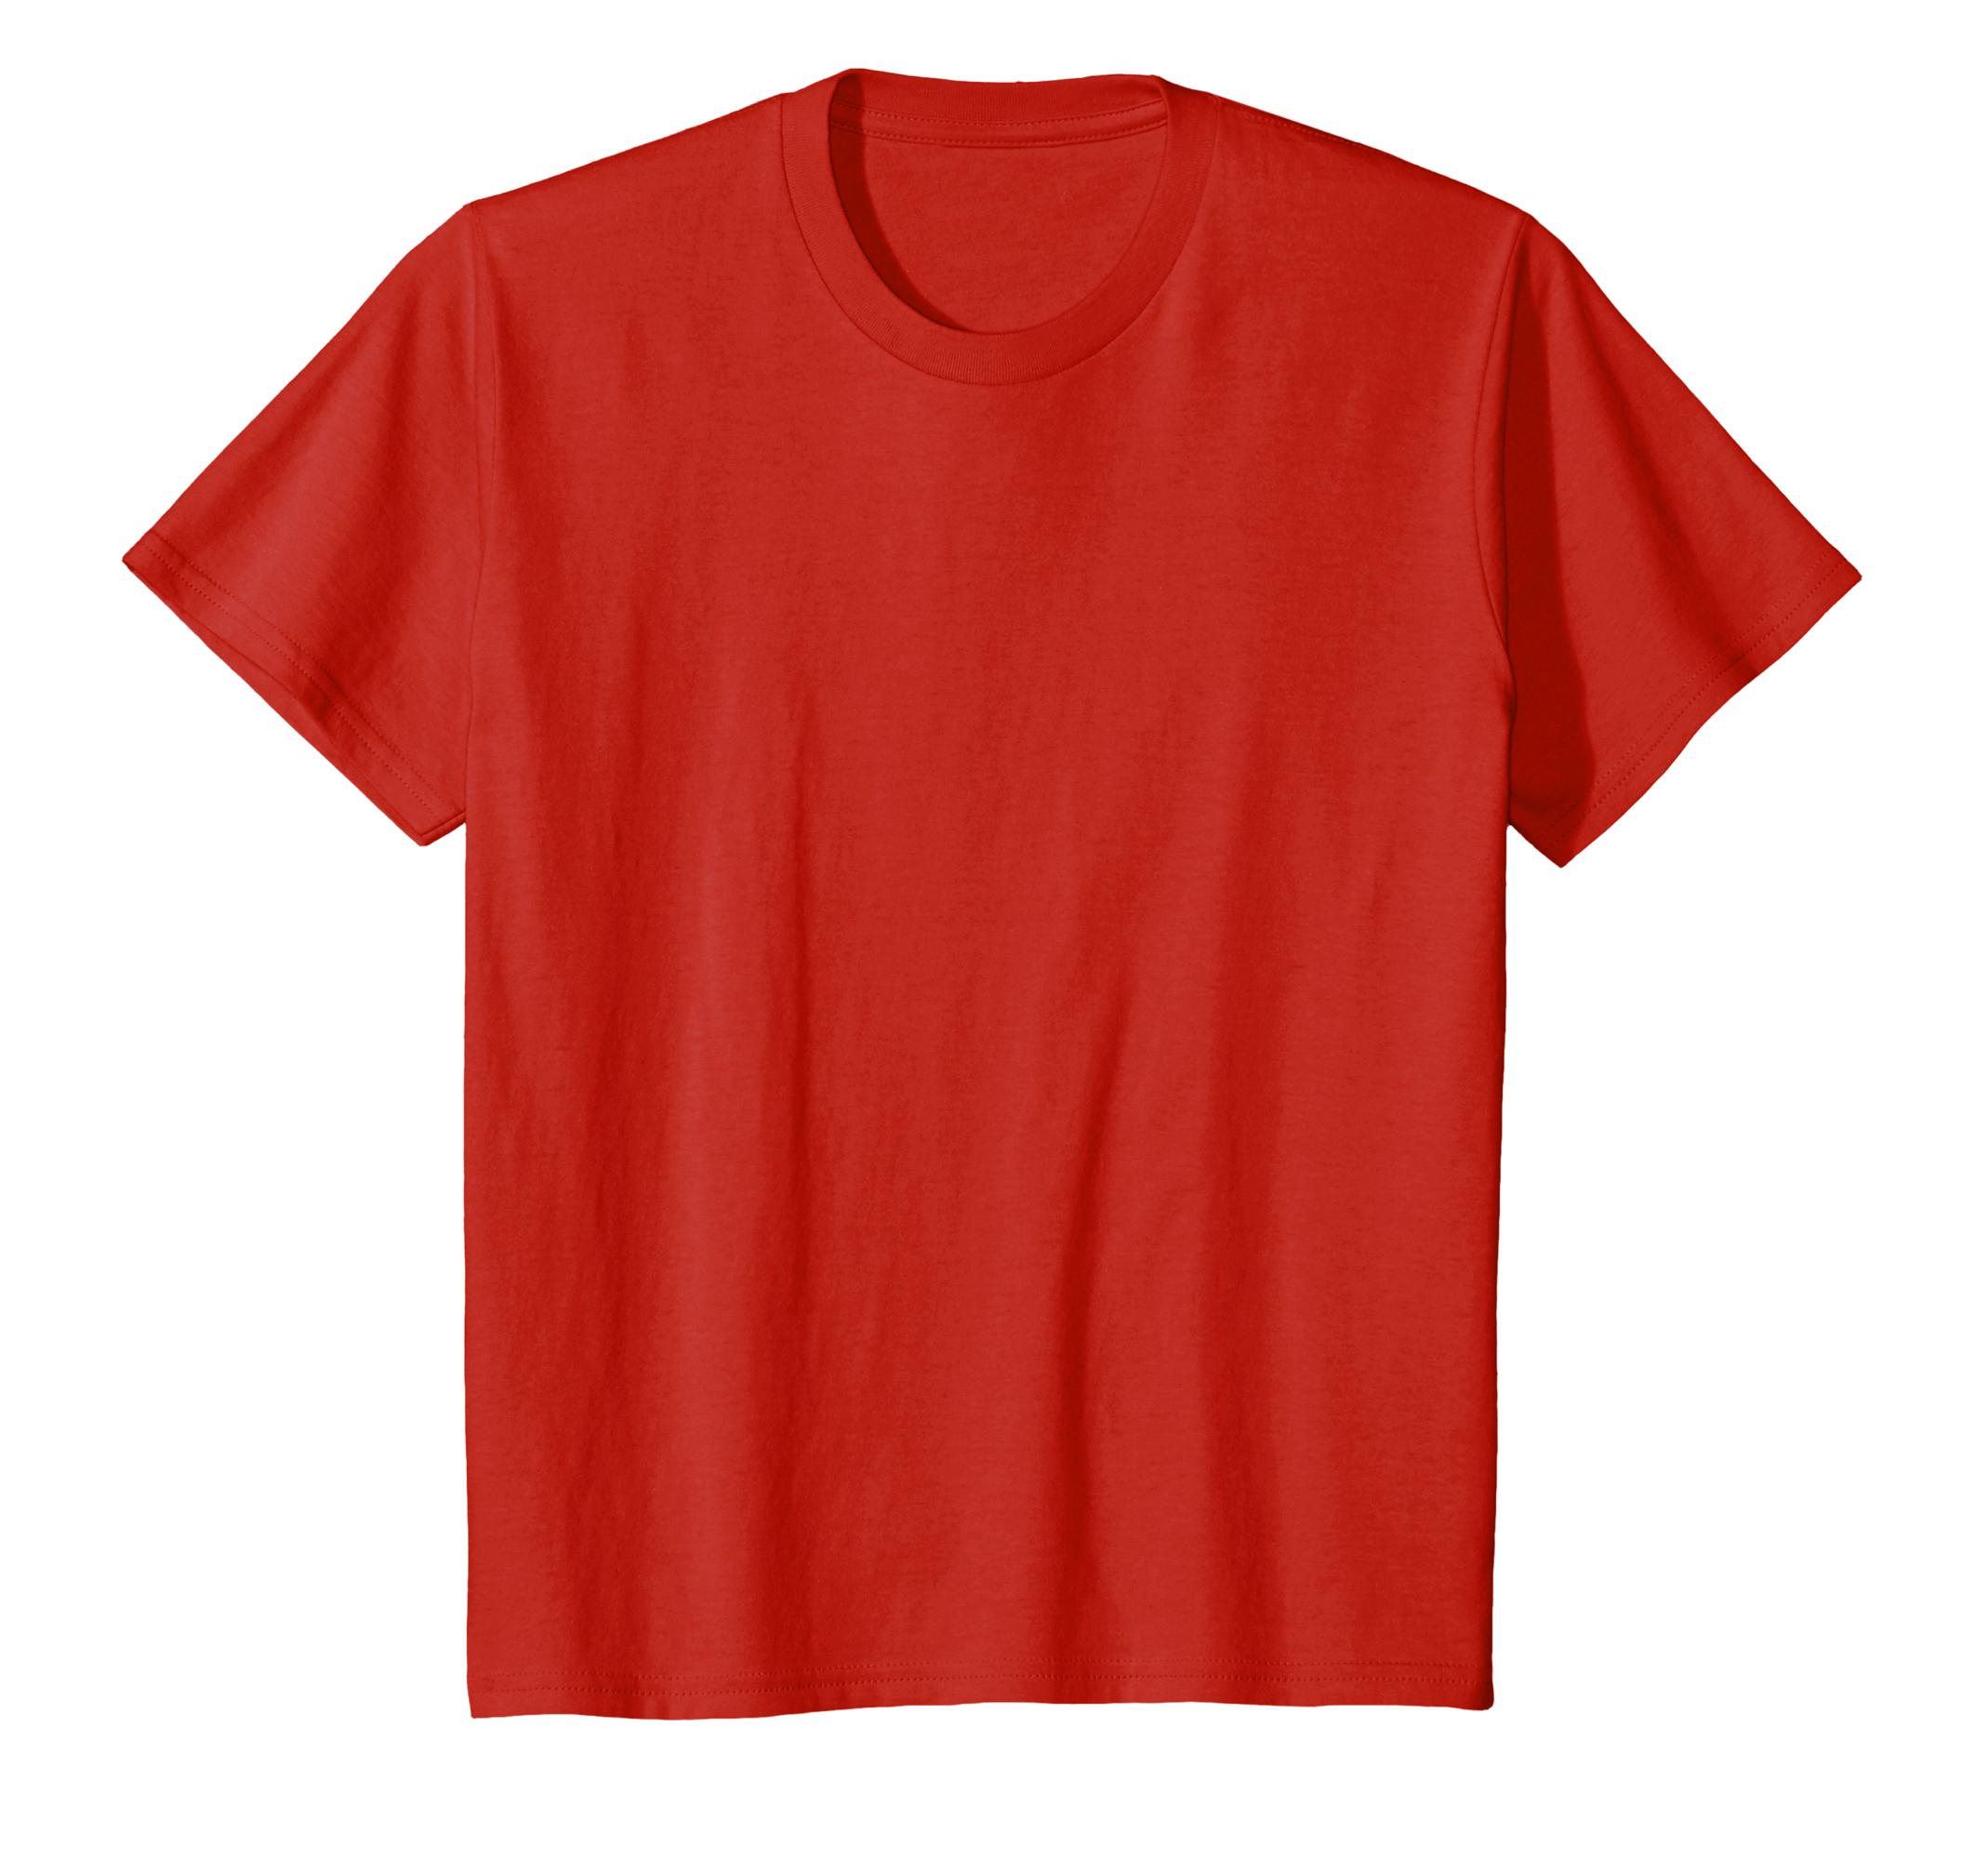 Dinosaur Rawr 5 Years Old Birthday Party Fun Gift Present Toddler Raglan T-Shirt